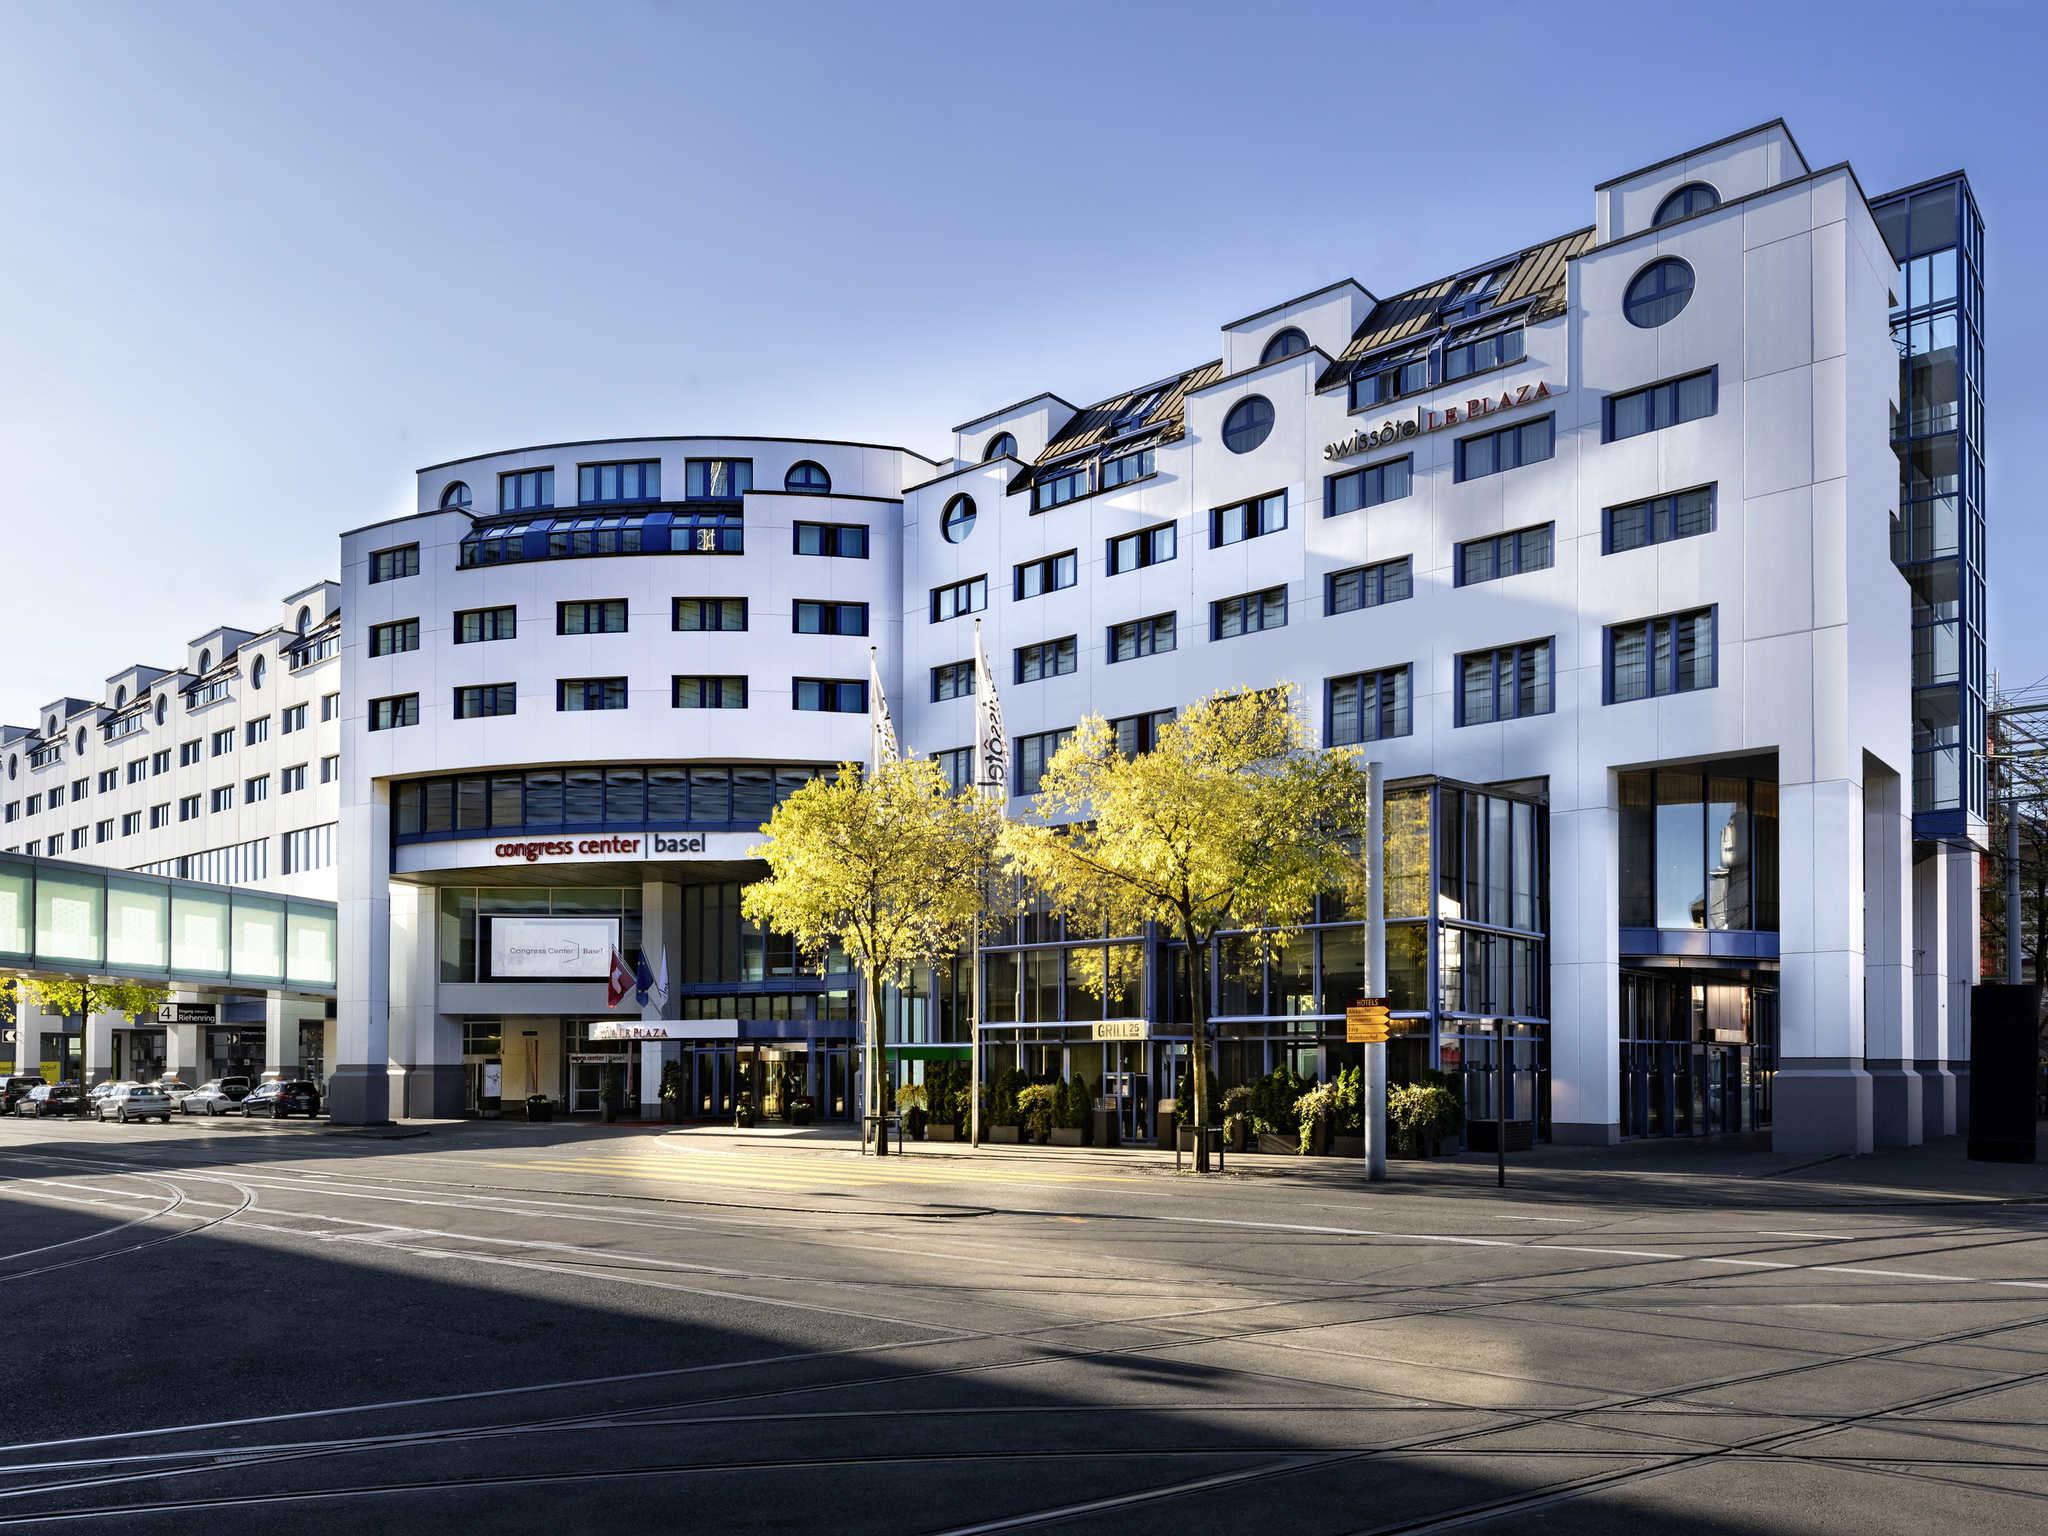 Otel – Swissôtel Le Plaza Basel